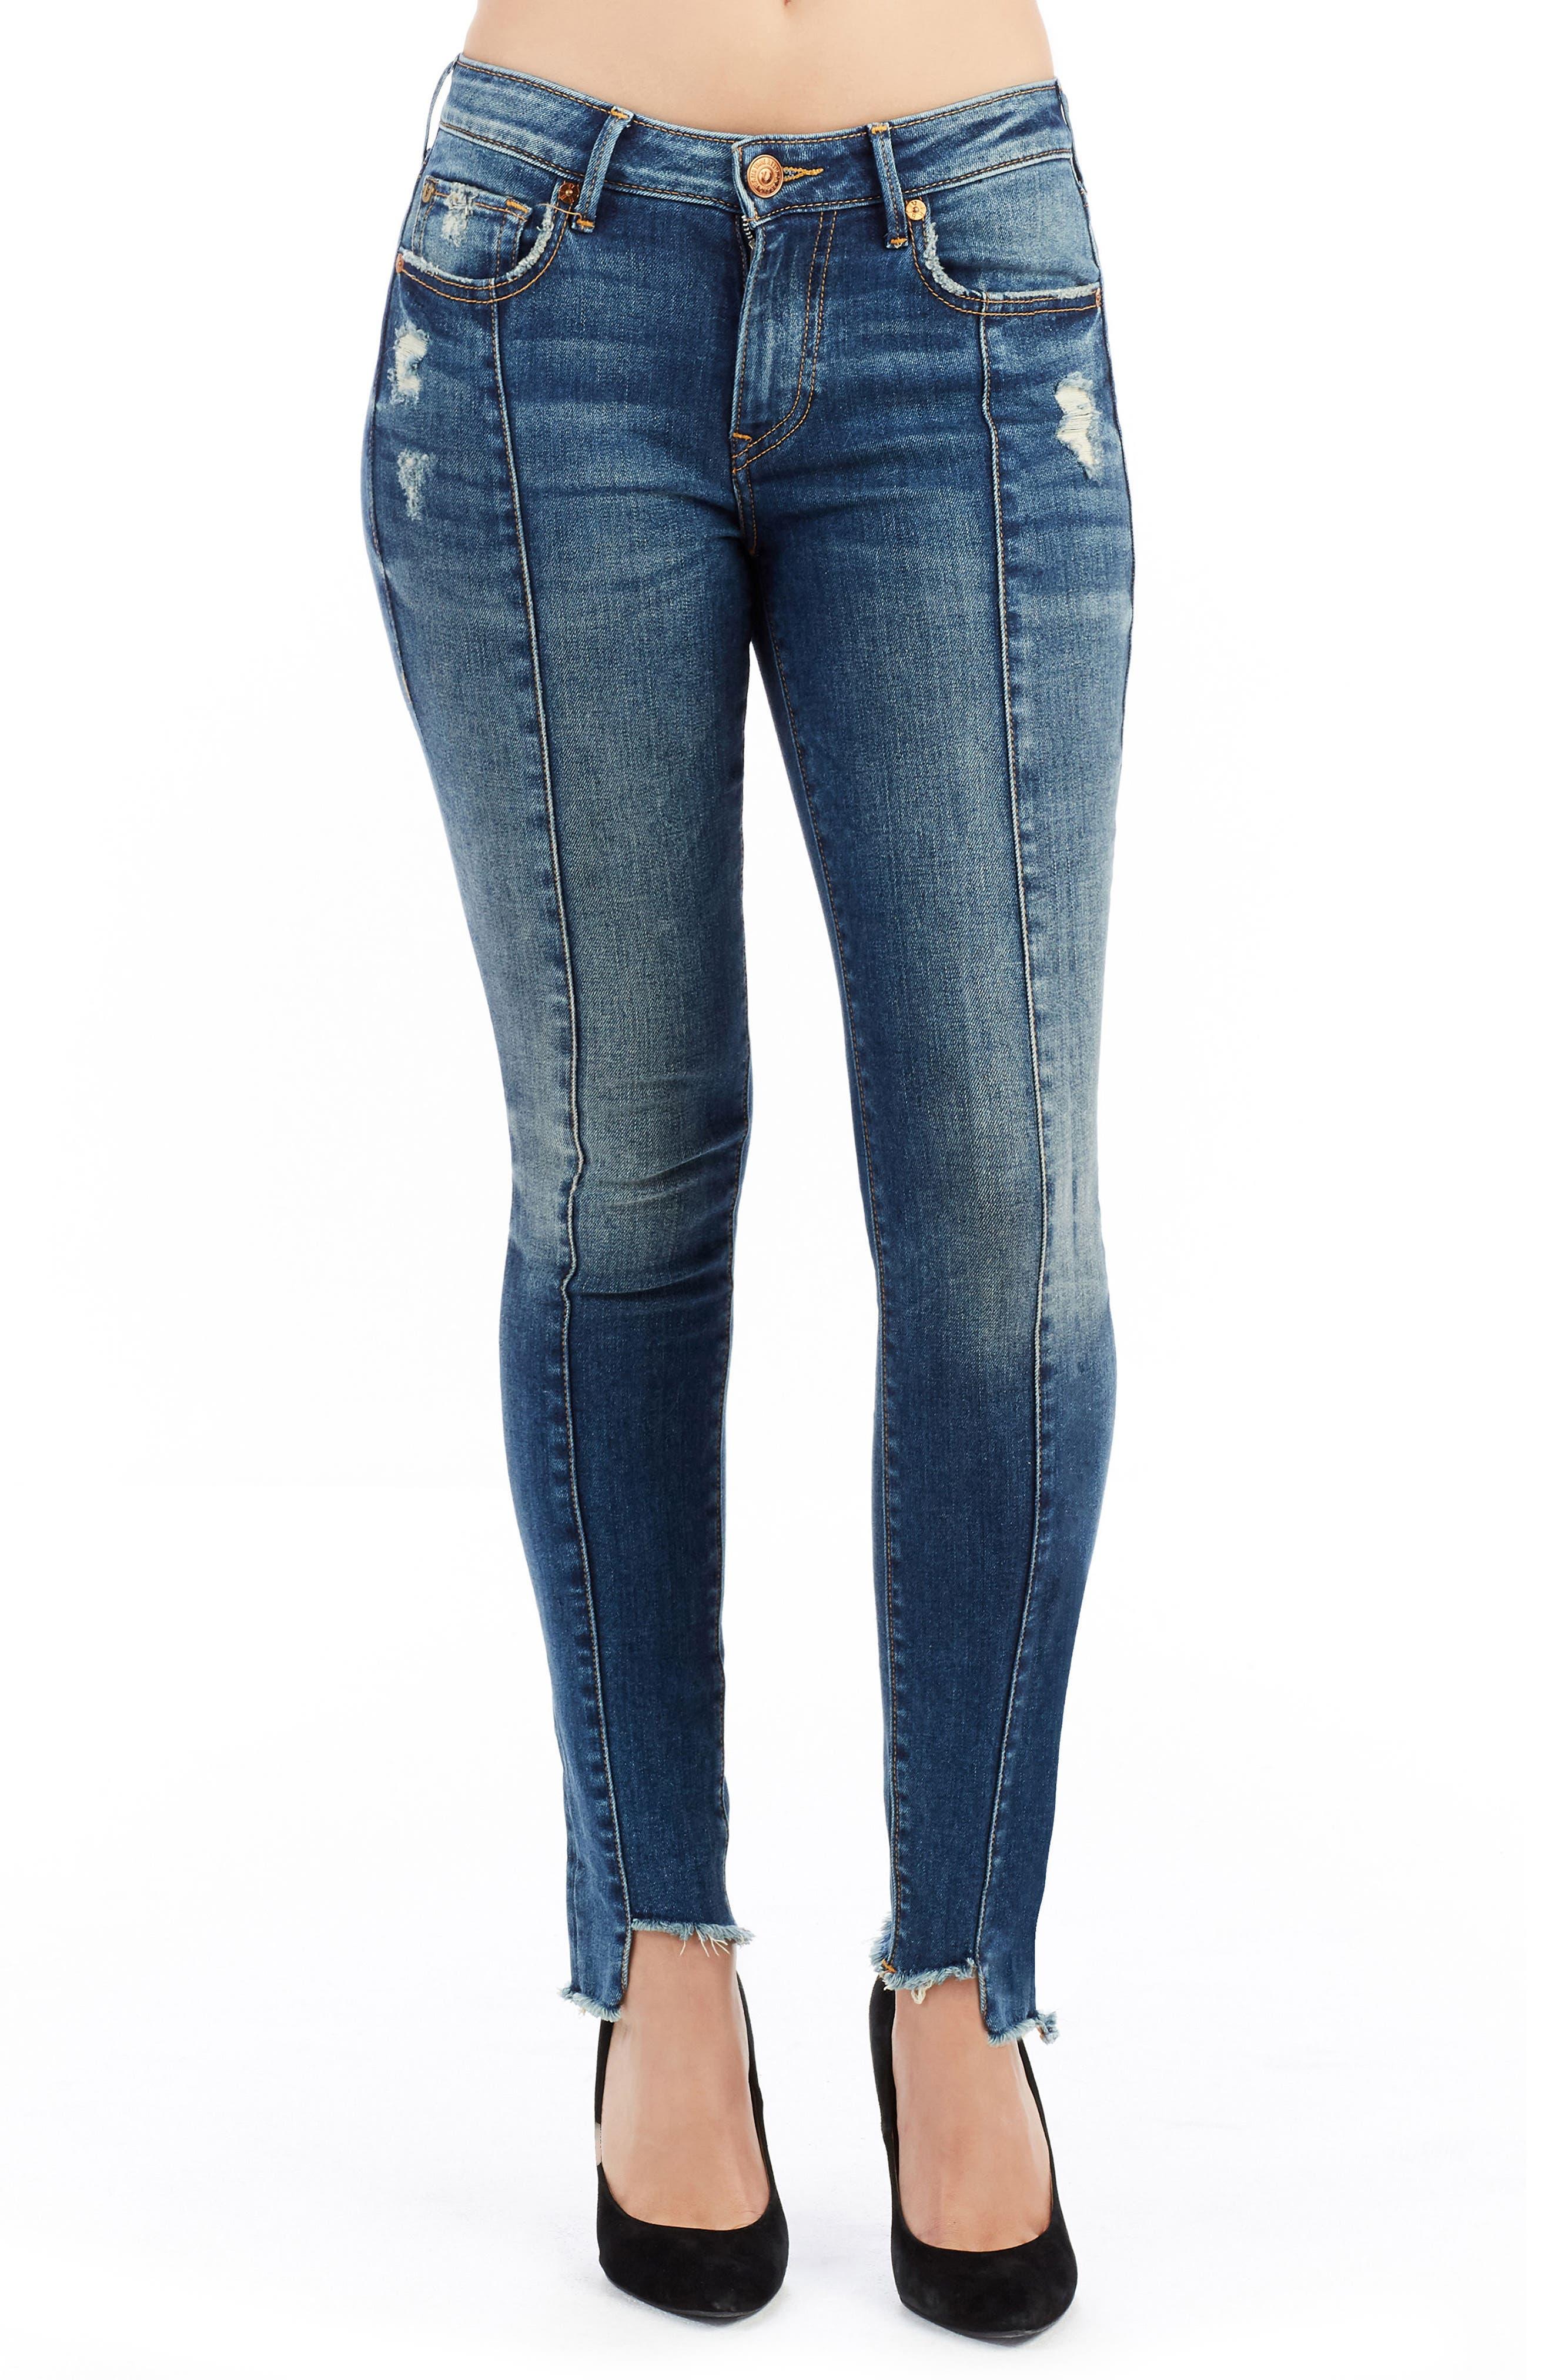 Jennie Curvy Skinny Jeans,                             Main thumbnail 1, color,                             Famous Blue Rock